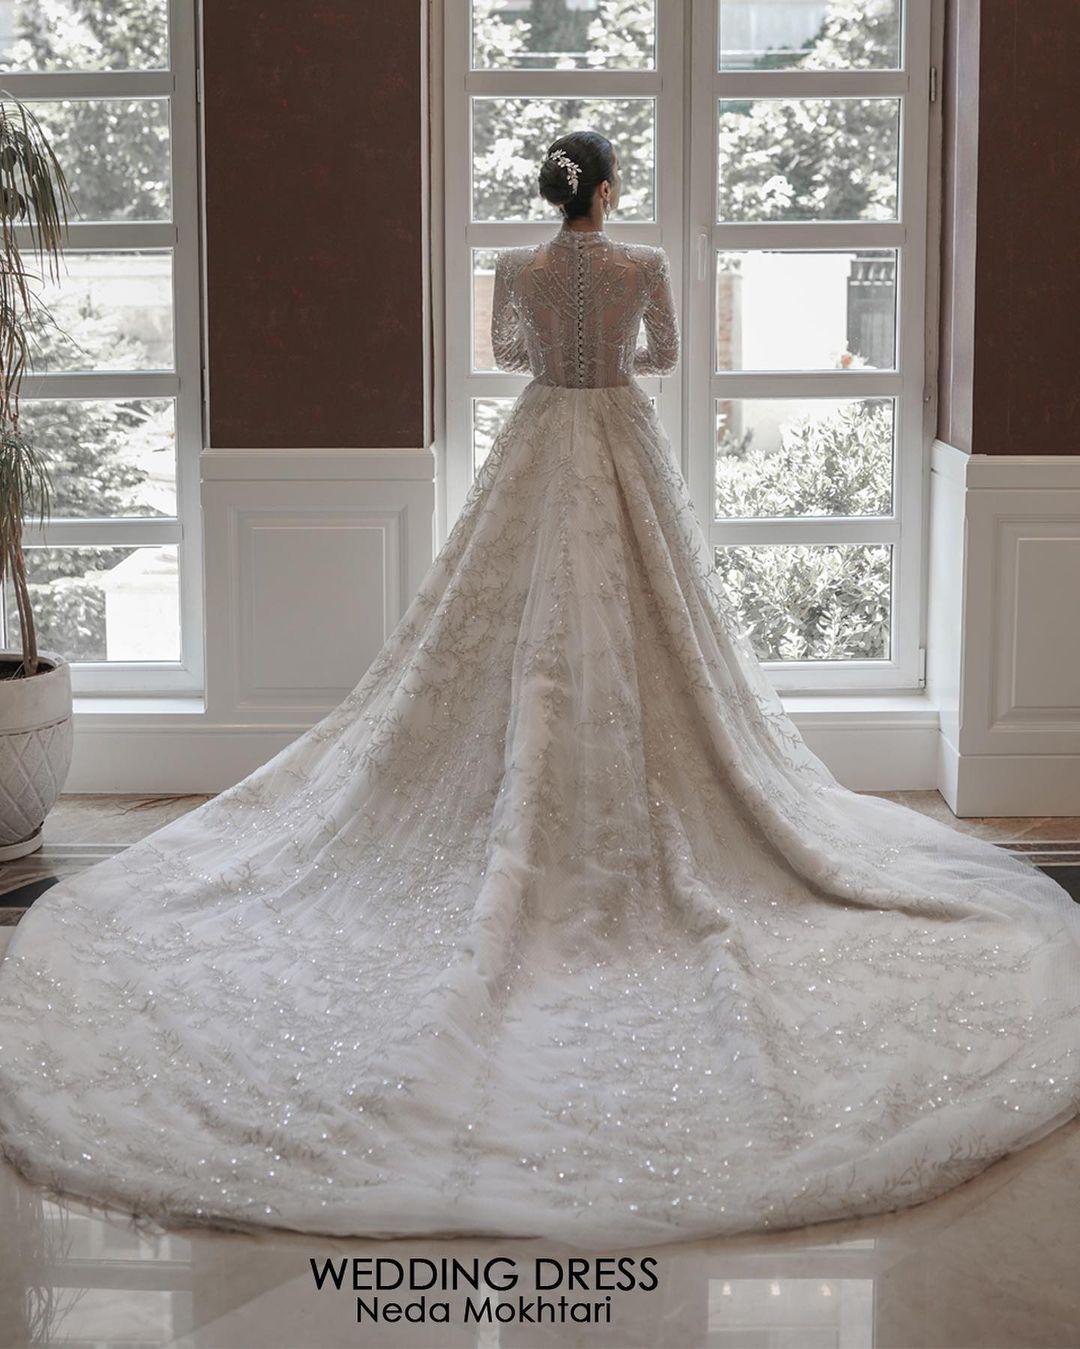 مزون لباس عروس ندا مختاری